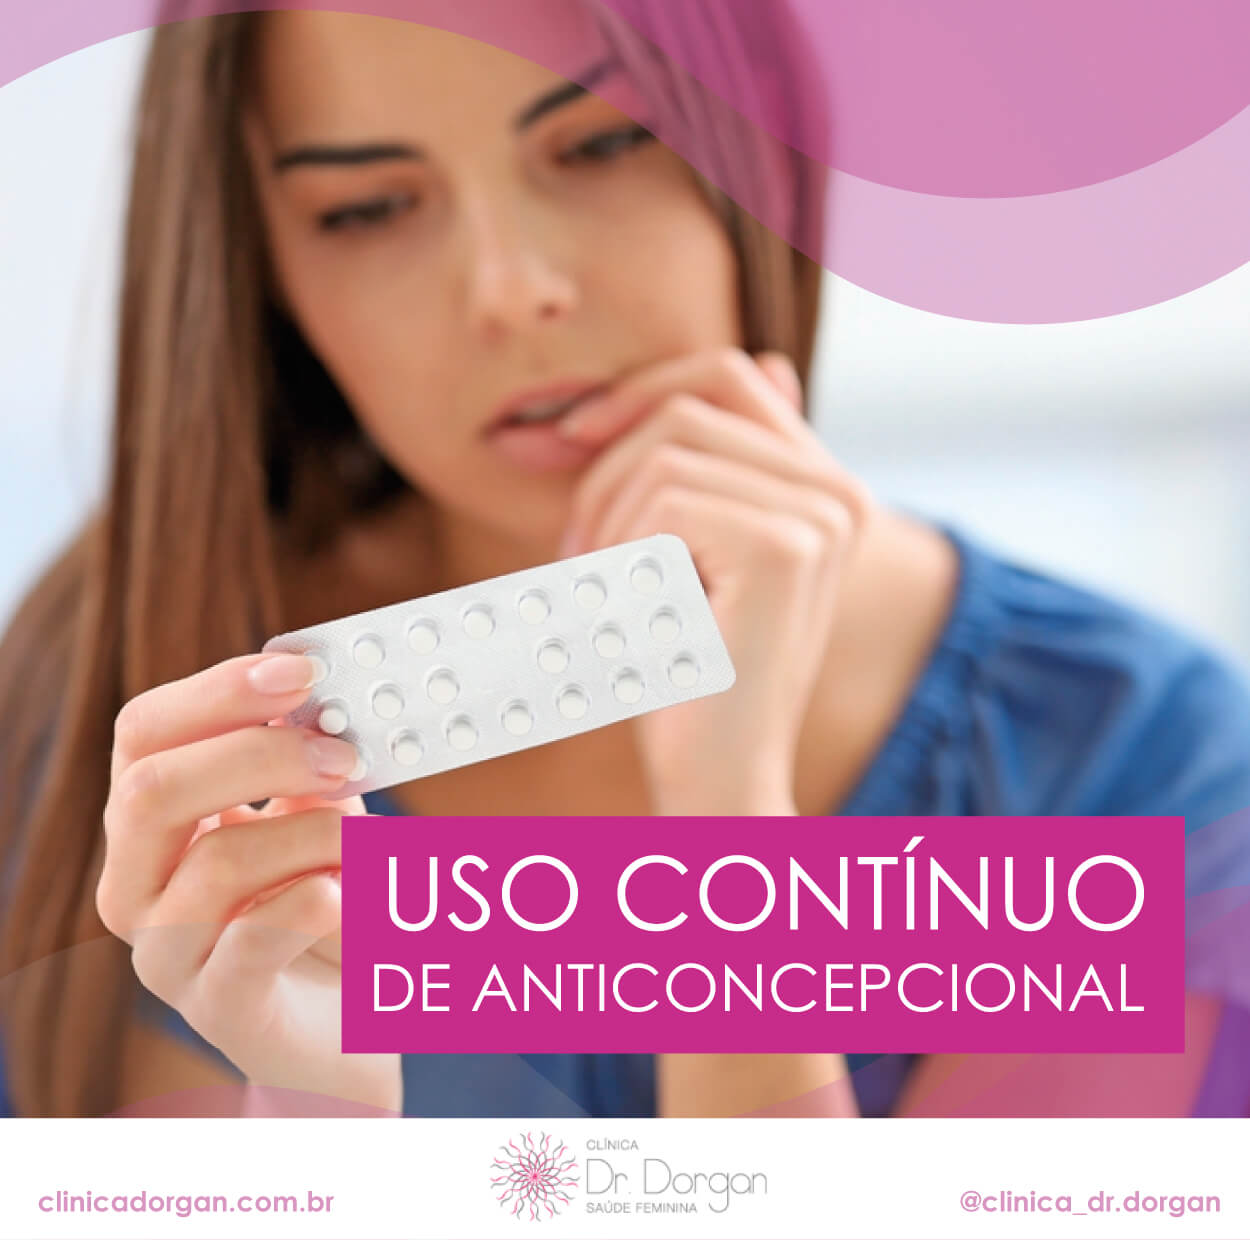 Uso Contínuo de Anticoncepcional - Clínica Doutor Dorgan